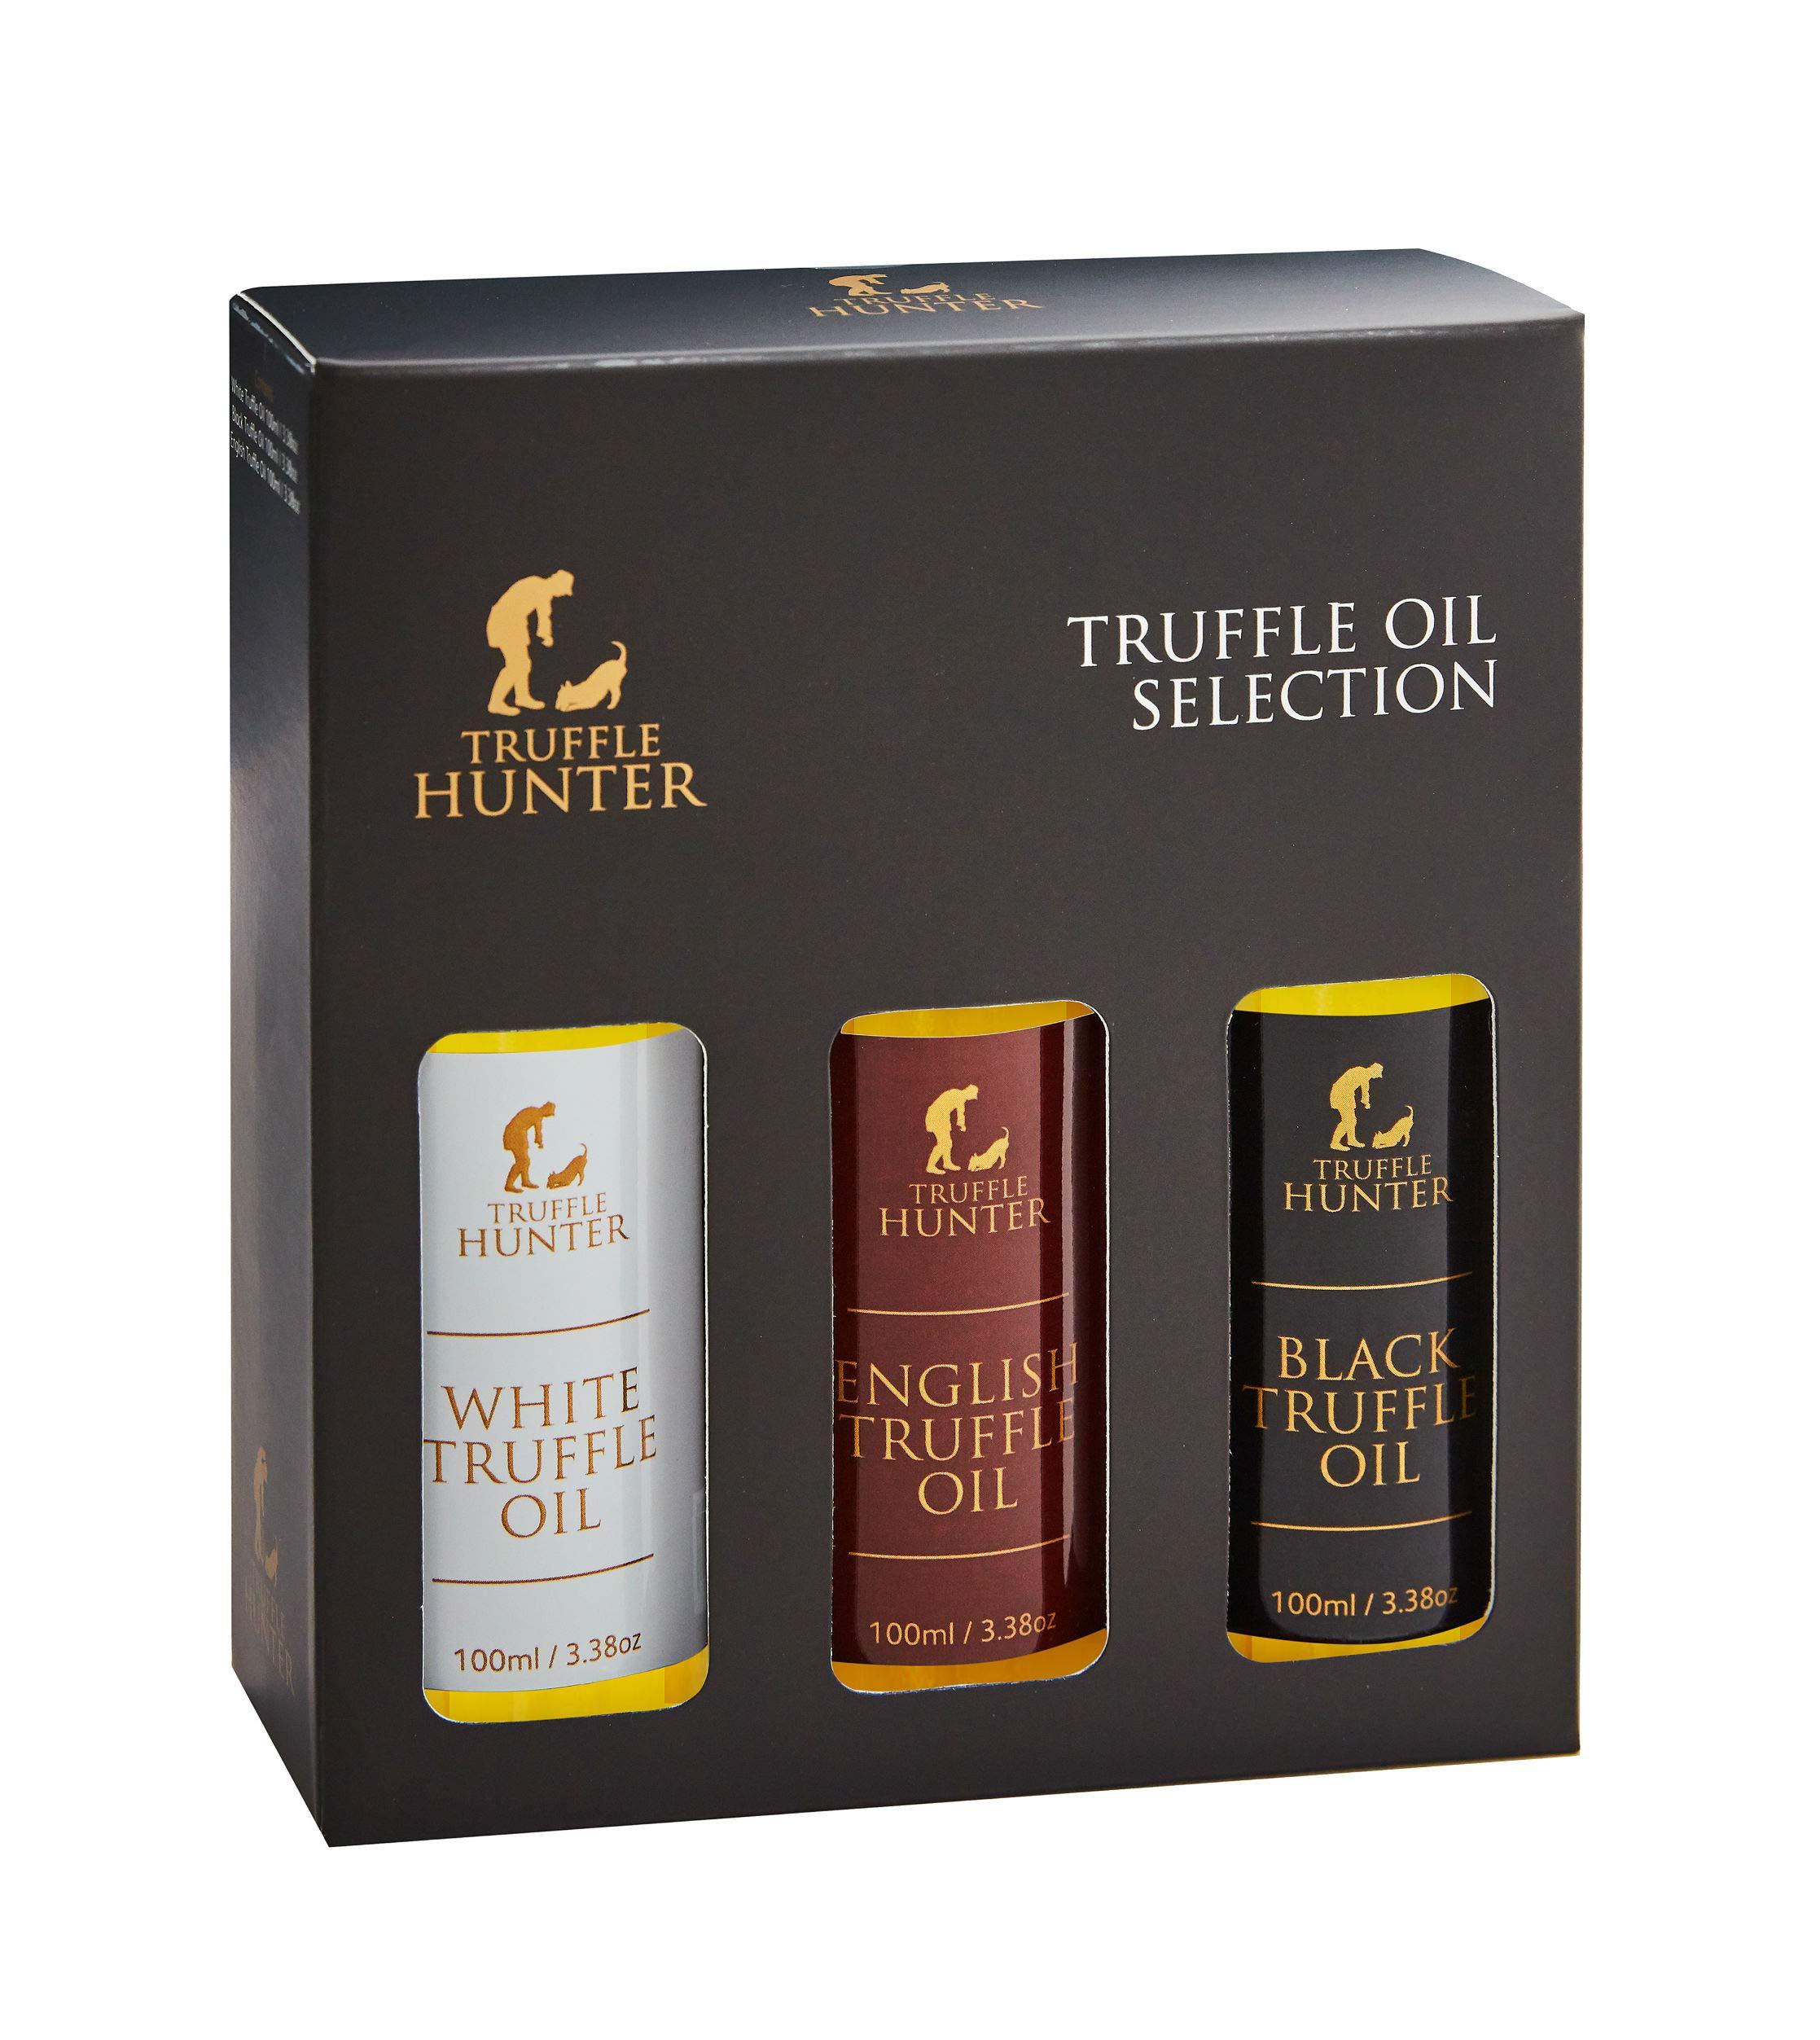 TruffleHunter Truffle Oil Selection Gift Set - White Truffle Oil, English & Black Truffle Oil (3 x 3.38 Oz) Cold Pressed Extra Virgin Olive Oil Seasoning Gourmet Food Condiments Salad Dressing by TruffleHunter